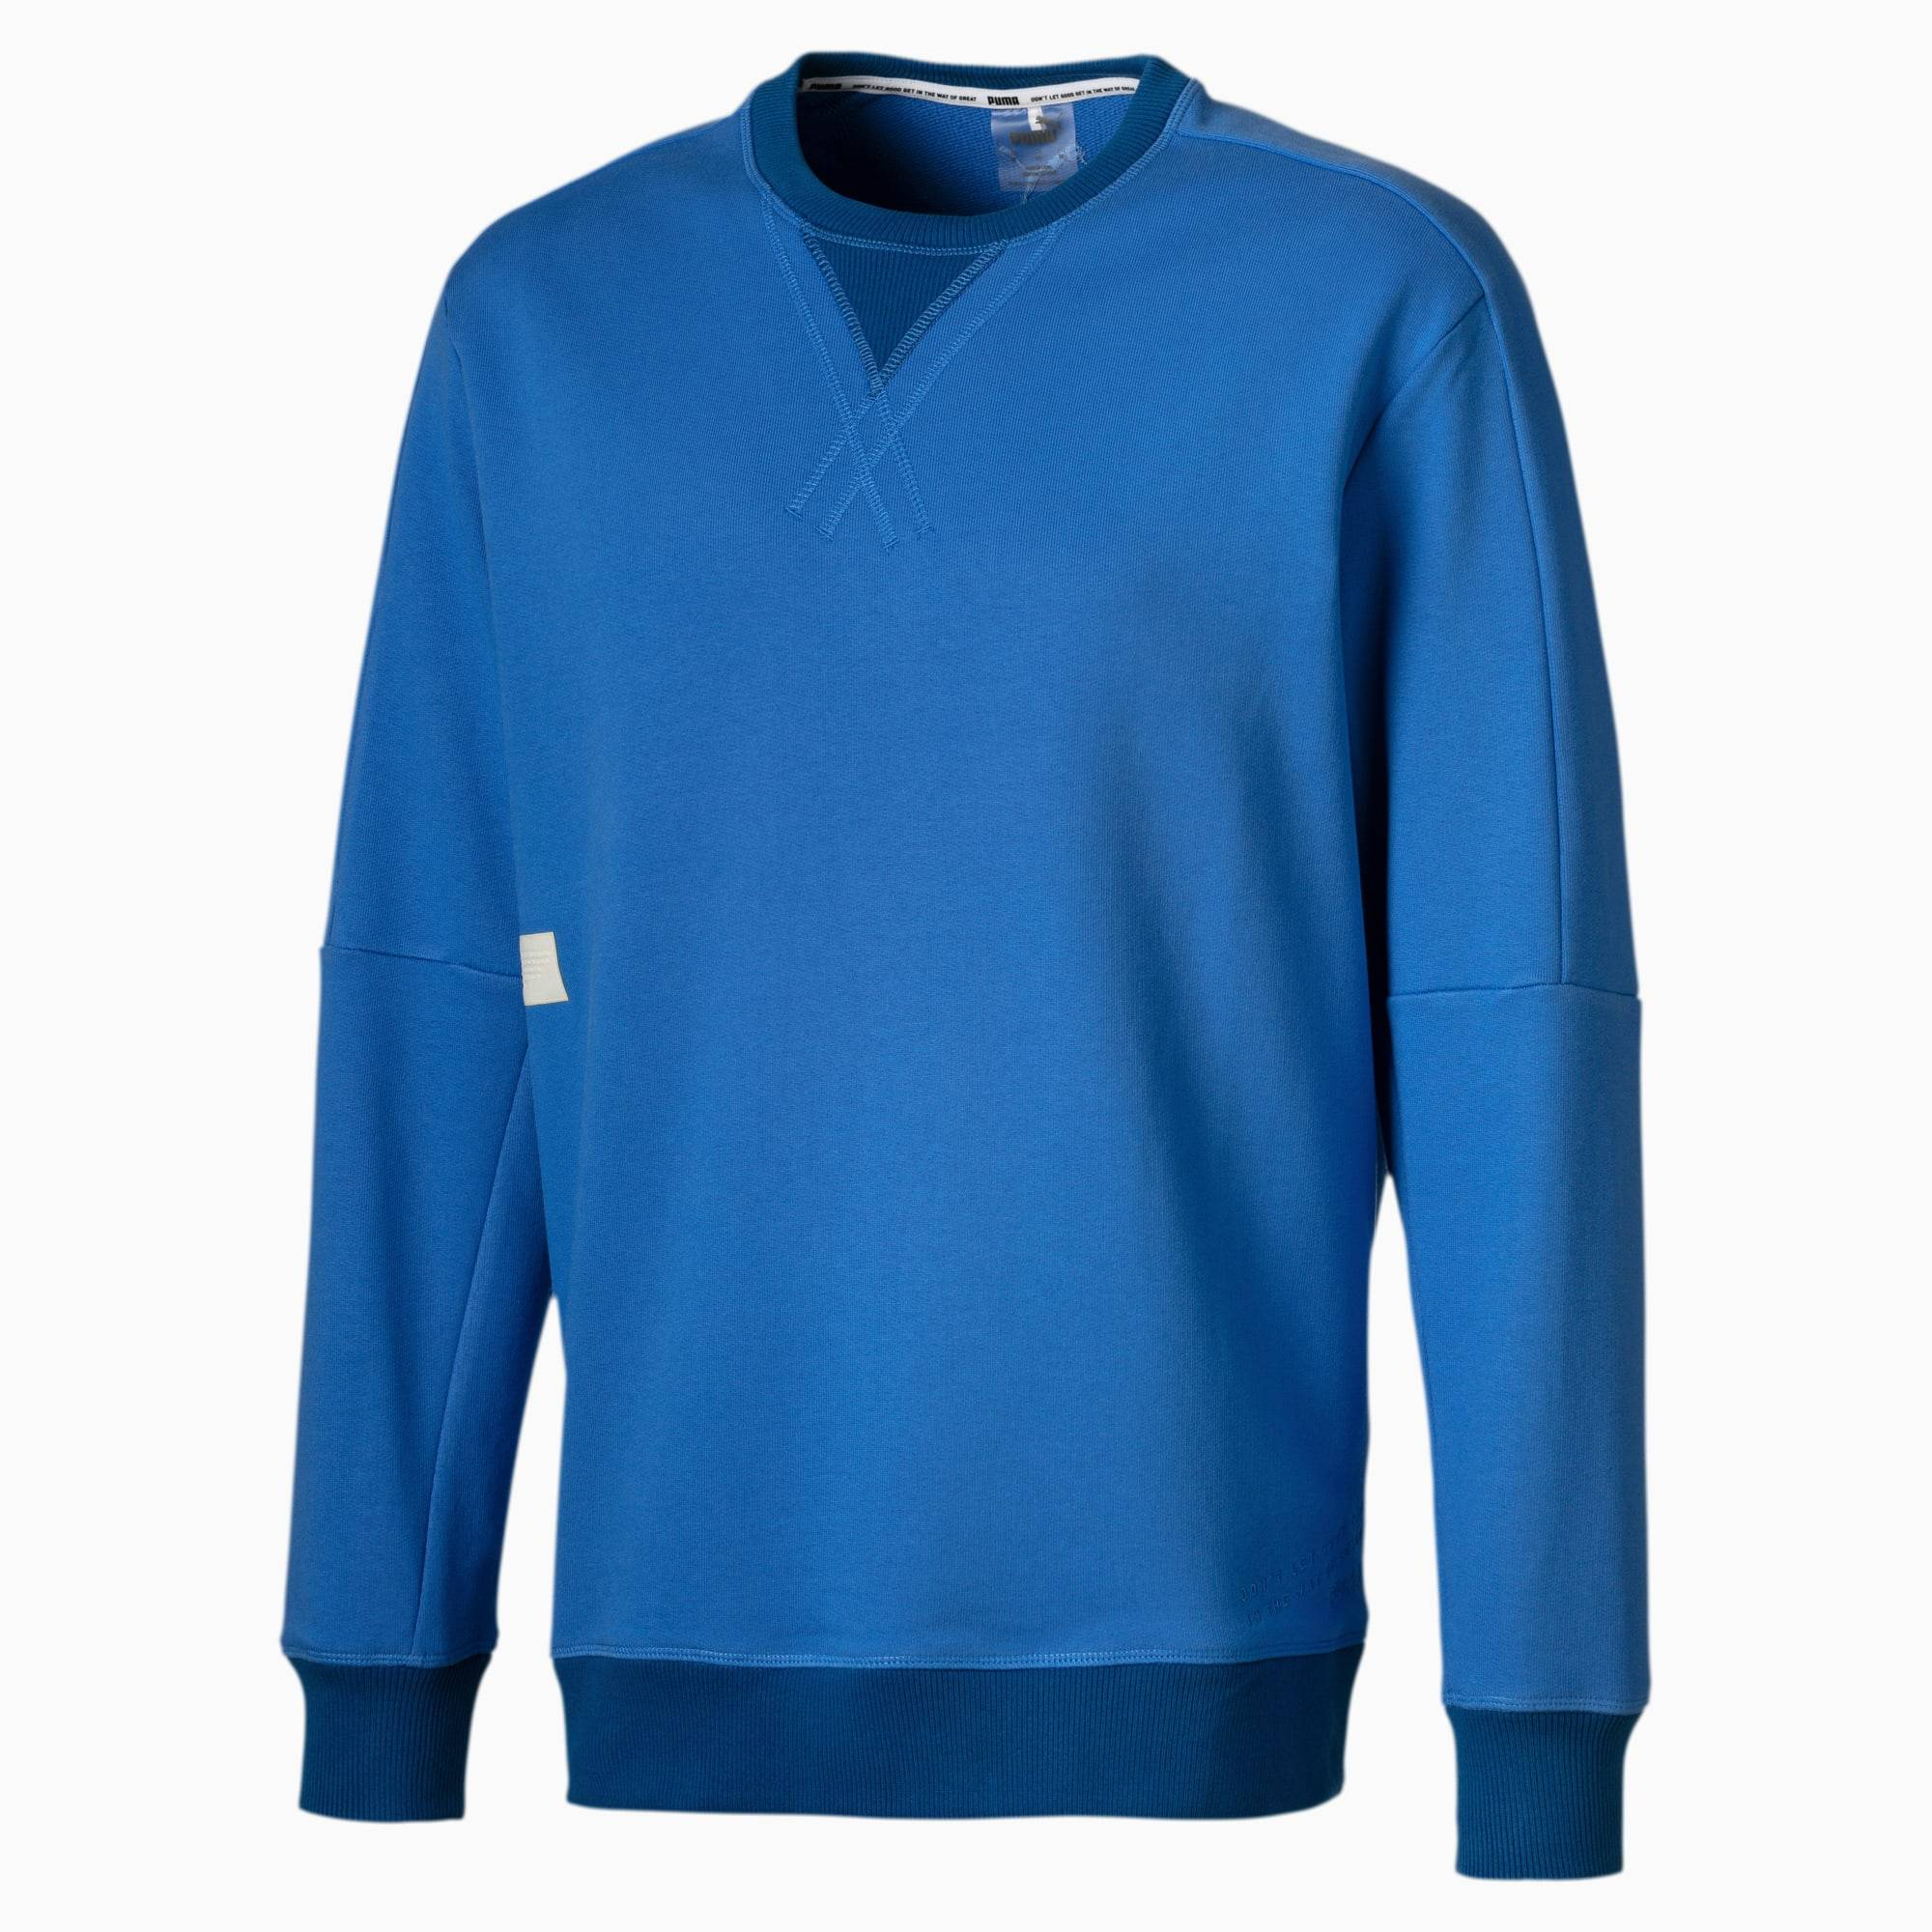 PUMA Sweat Jump Hook Basketball pour Homme, Bleu, Taille 4XL, Vêtements